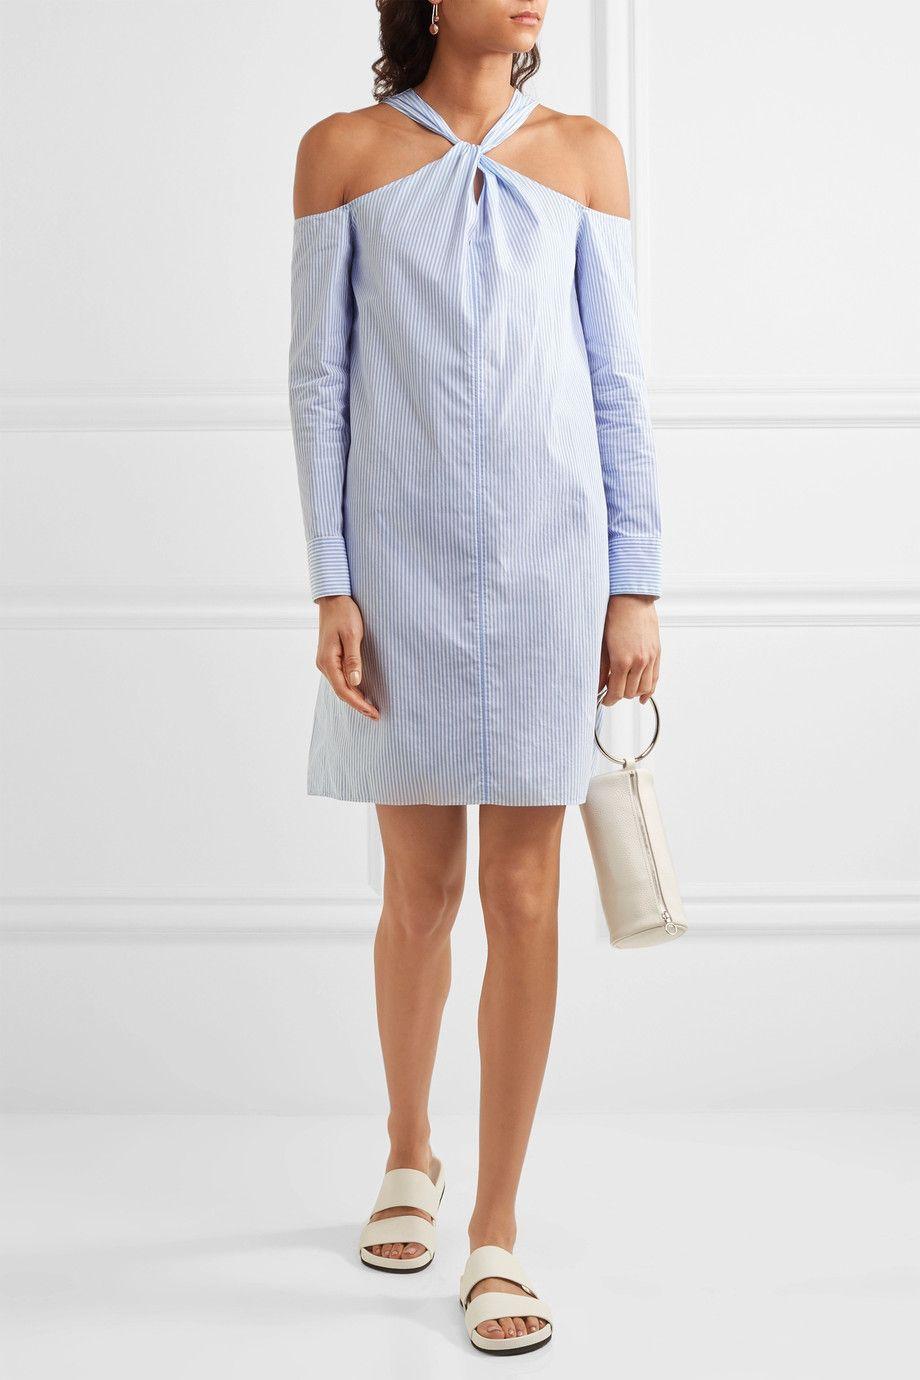 Rag & Bone Woman Cold-shoulder Striped Cotton-poplin Mini Dress Light Blue Size S Rag & Bone yzwF93Q